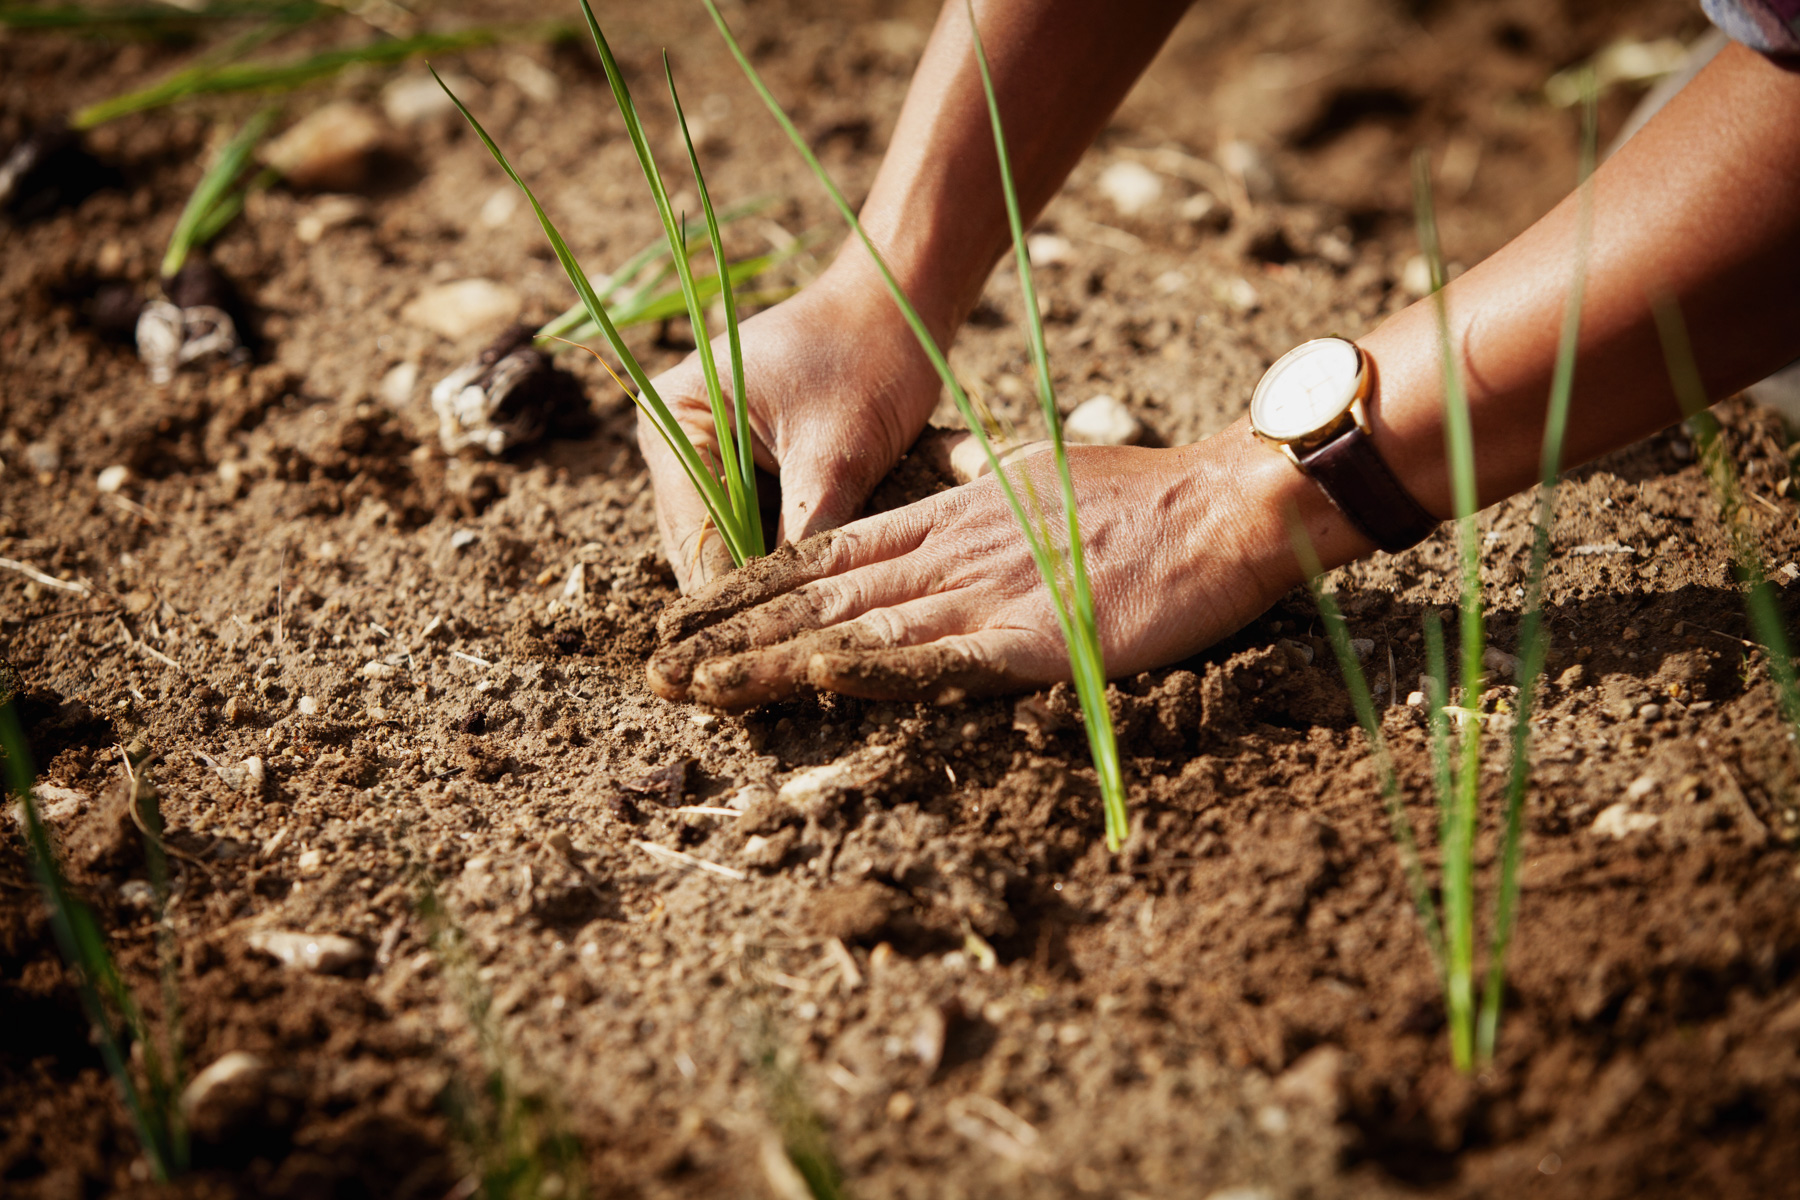 onion-hand-planting